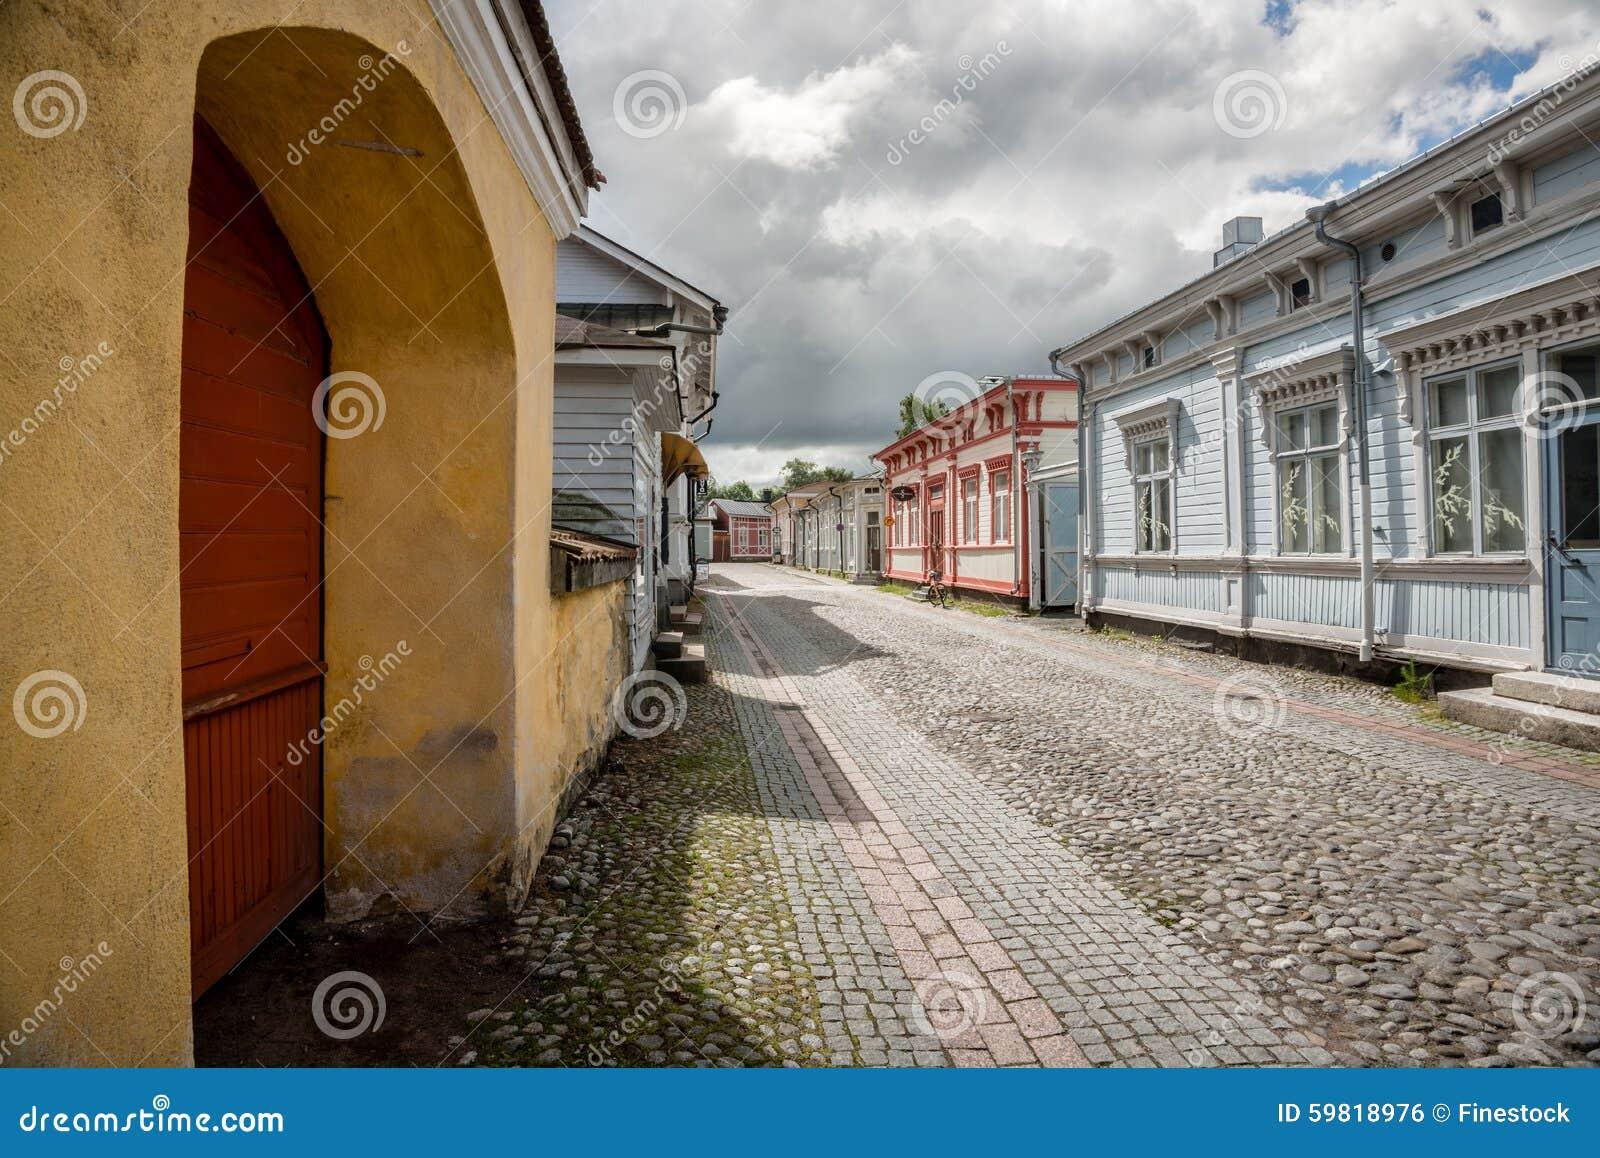 alte holzh user in rauma finnland stockfoto bild von haus skandinavien 59818976. Black Bedroom Furniture Sets. Home Design Ideas